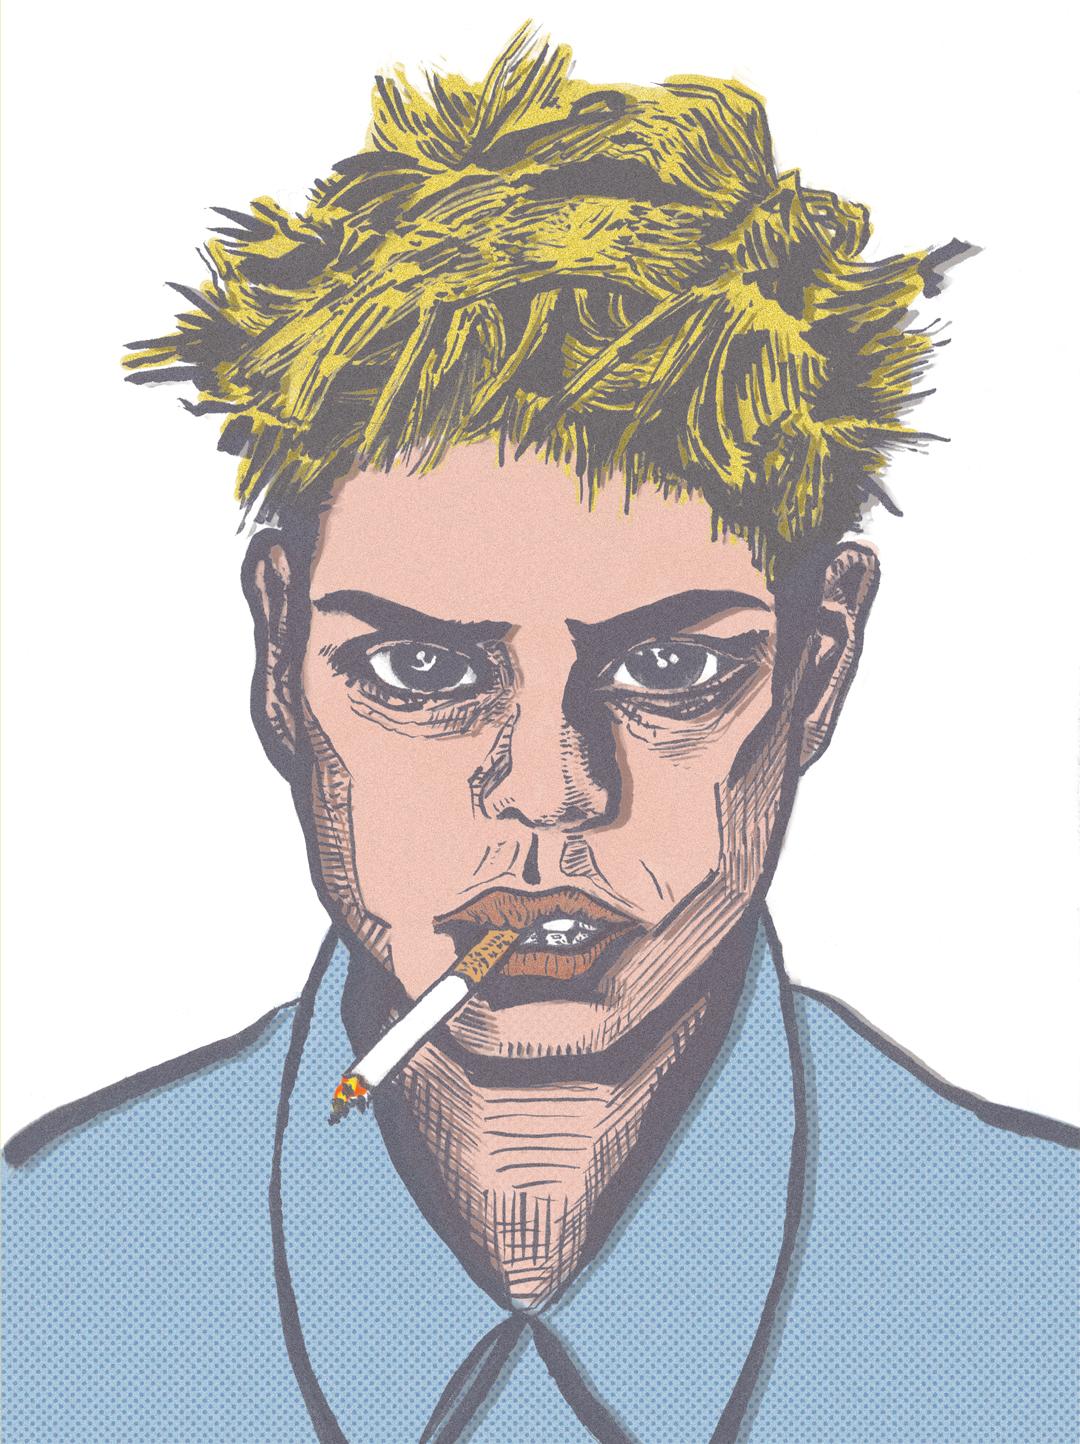 Portrait  //  brush pen, digital  //  January 2018